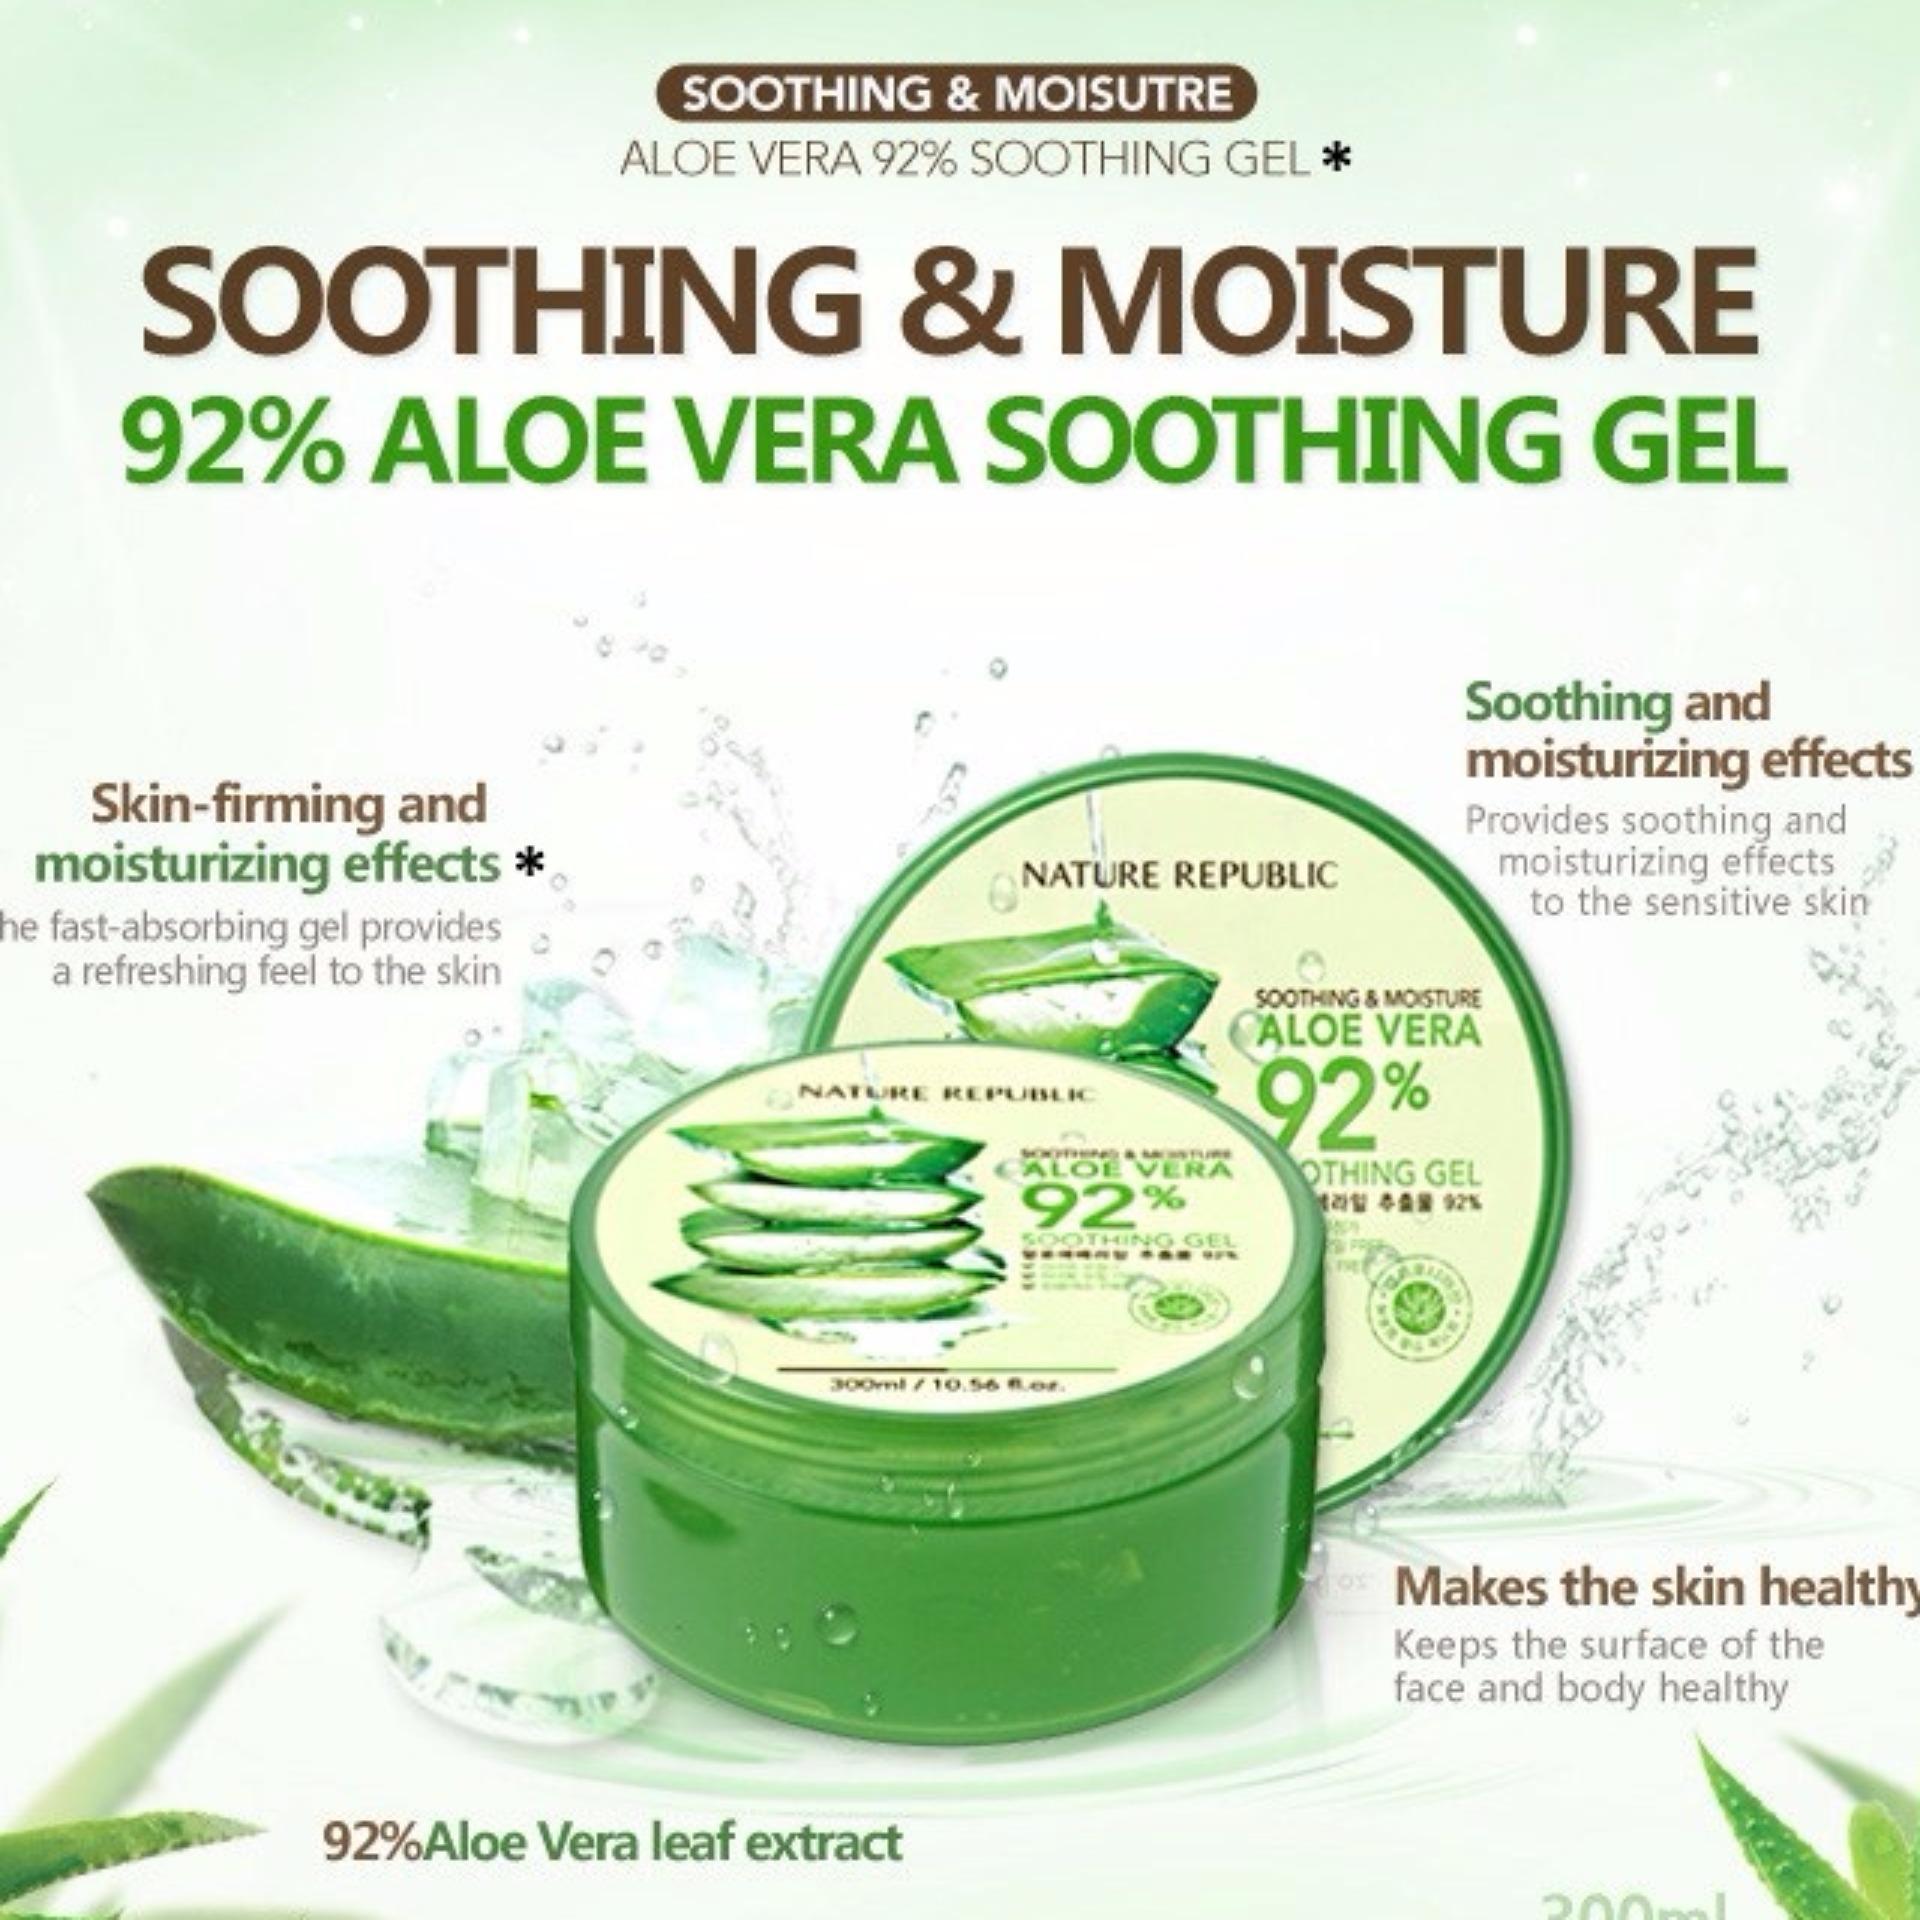 Promo Bioaqua Soothing And Moisture Aloe Vera Gel 92 Terbaru 2018 Mountea Teh 180ml Karton Philippines Nature Republic Price Listing